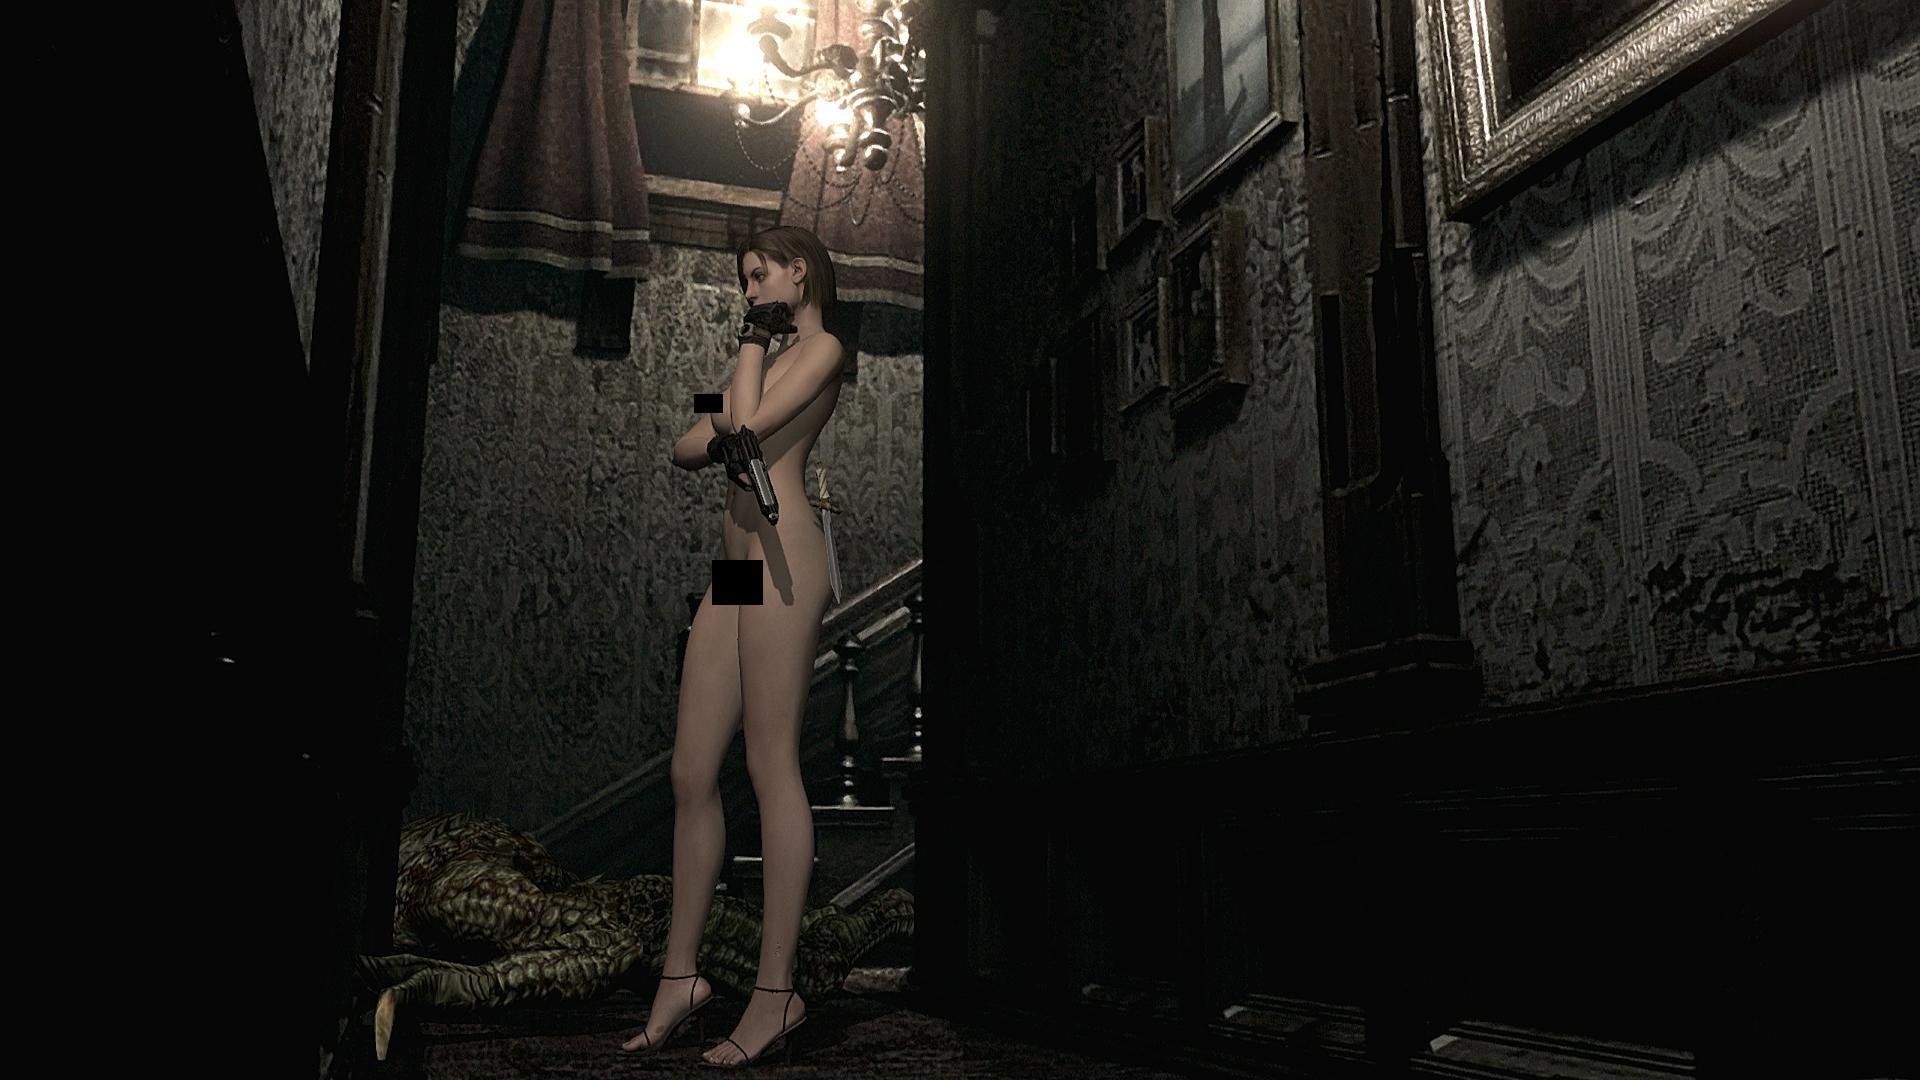 Resident evil hardcore porn erotic scenes